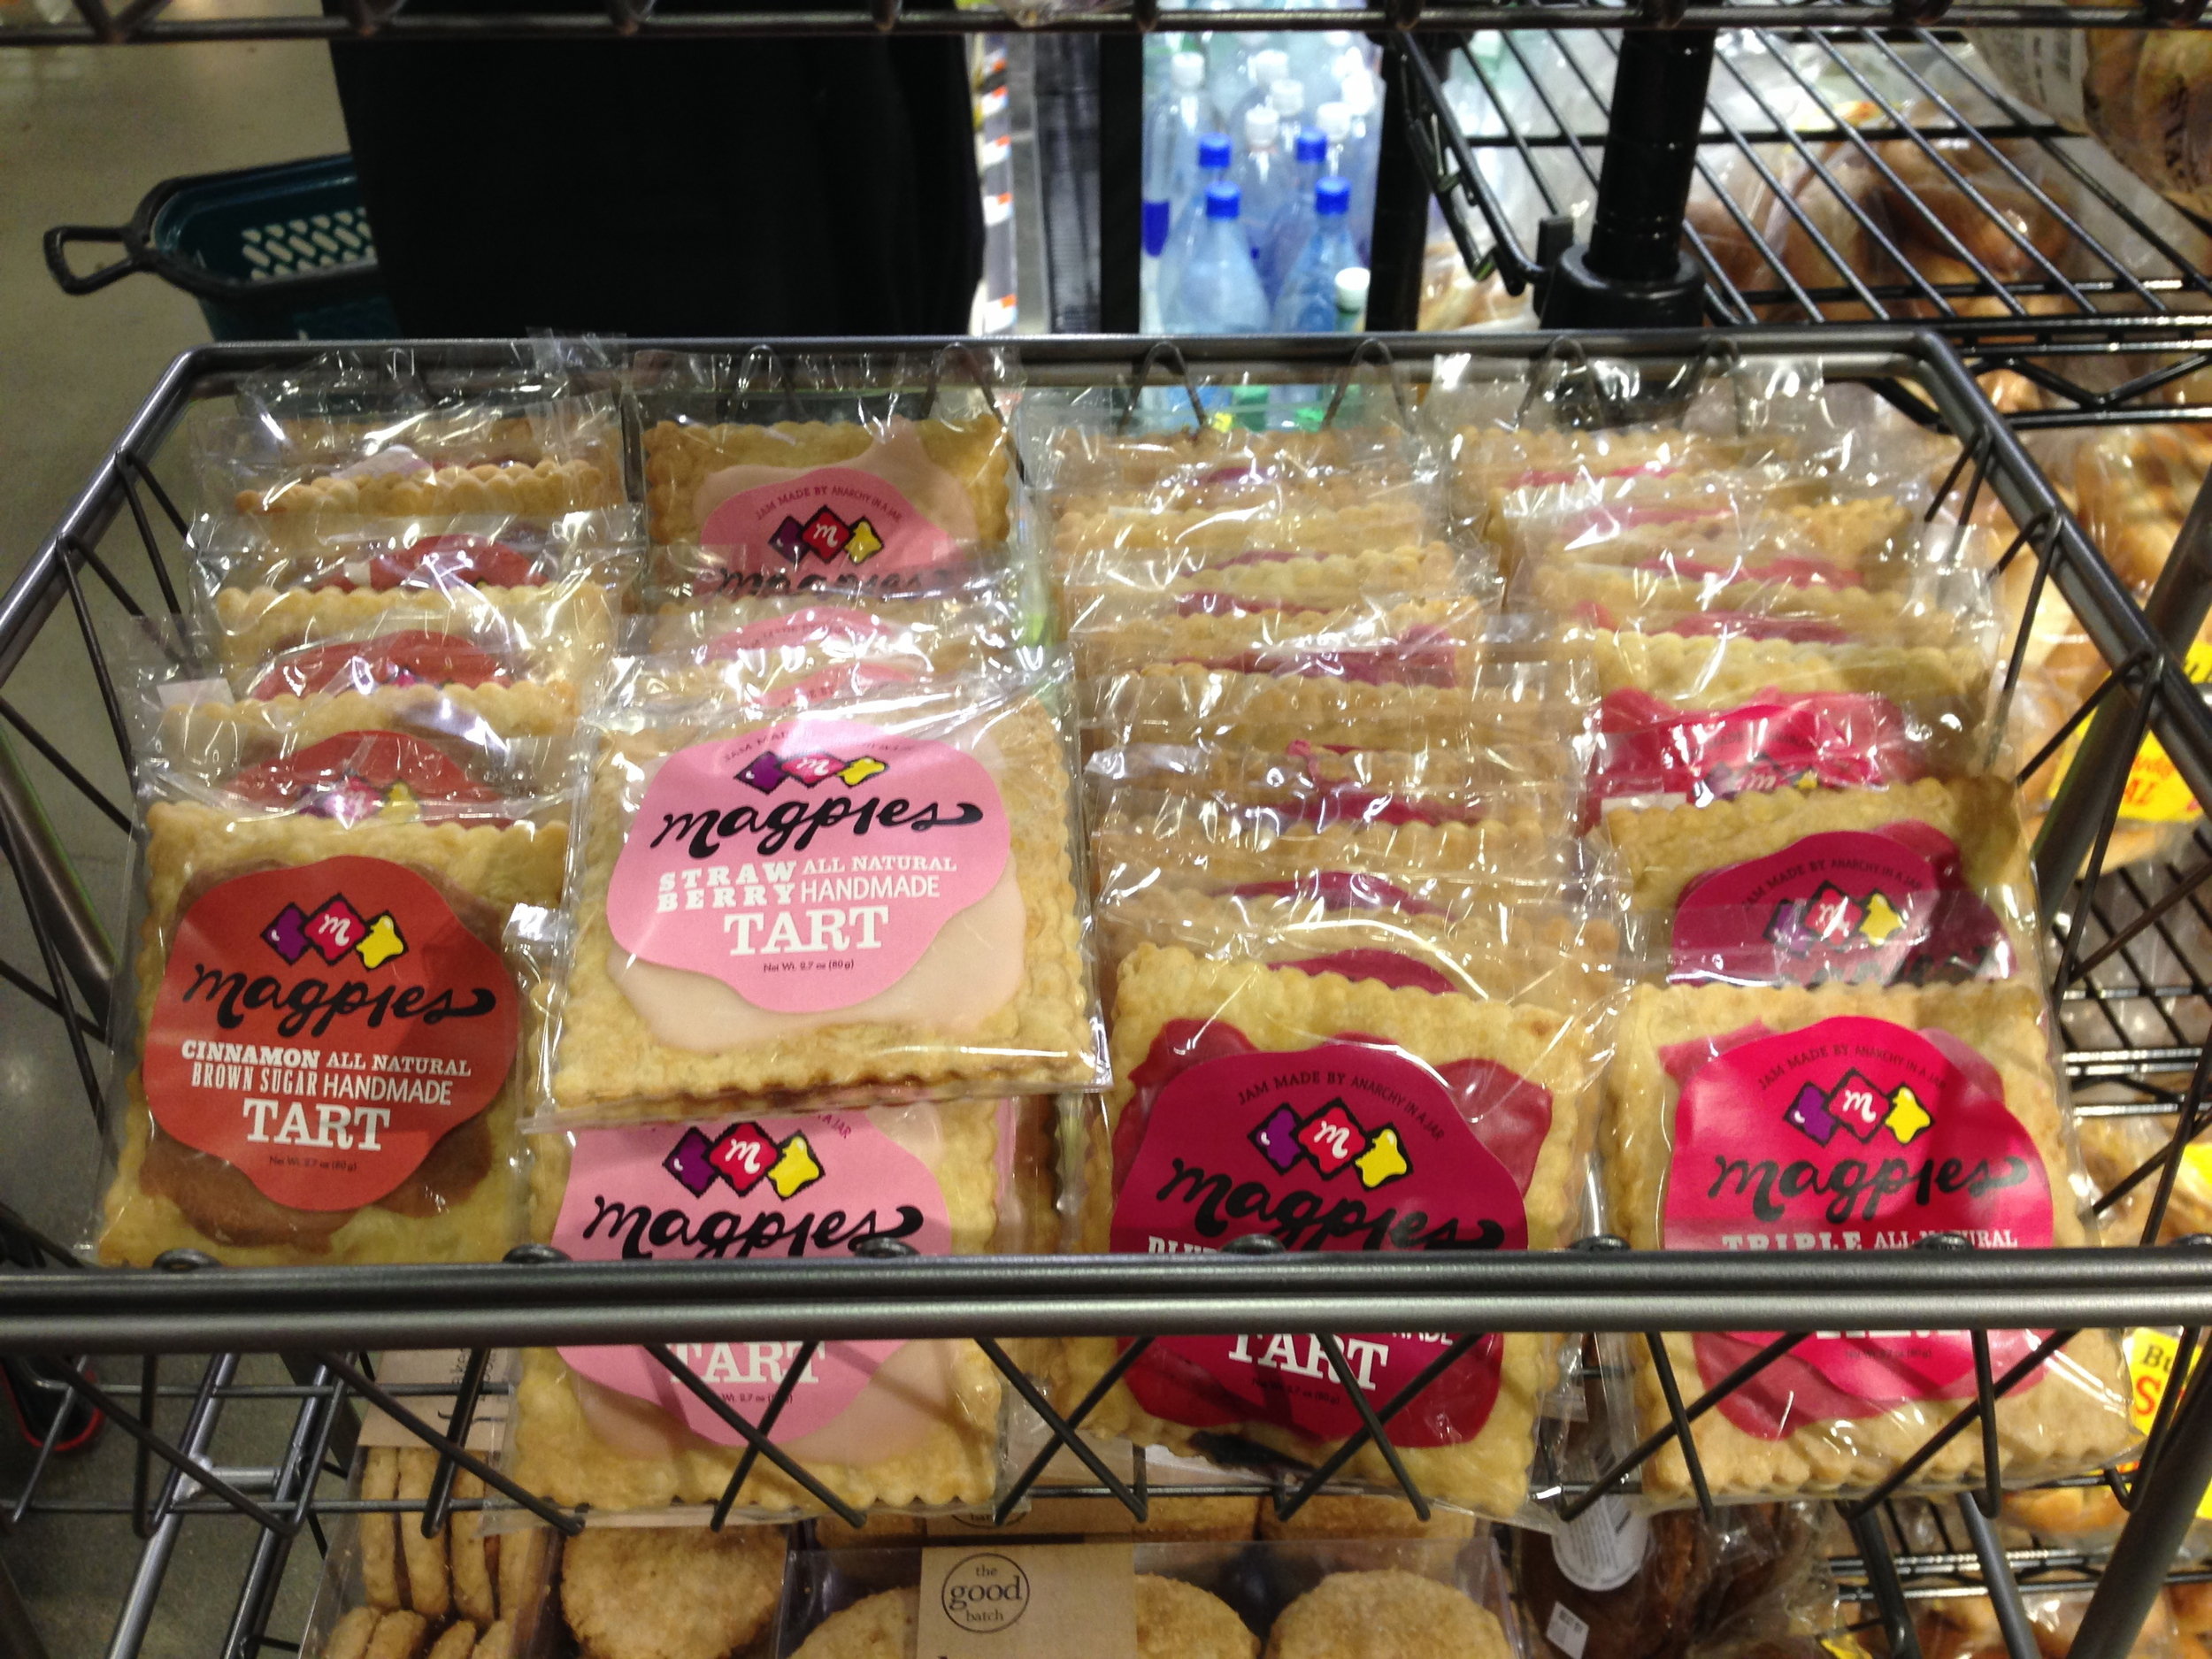 Magpies on display, Whole Foods, Gowanus